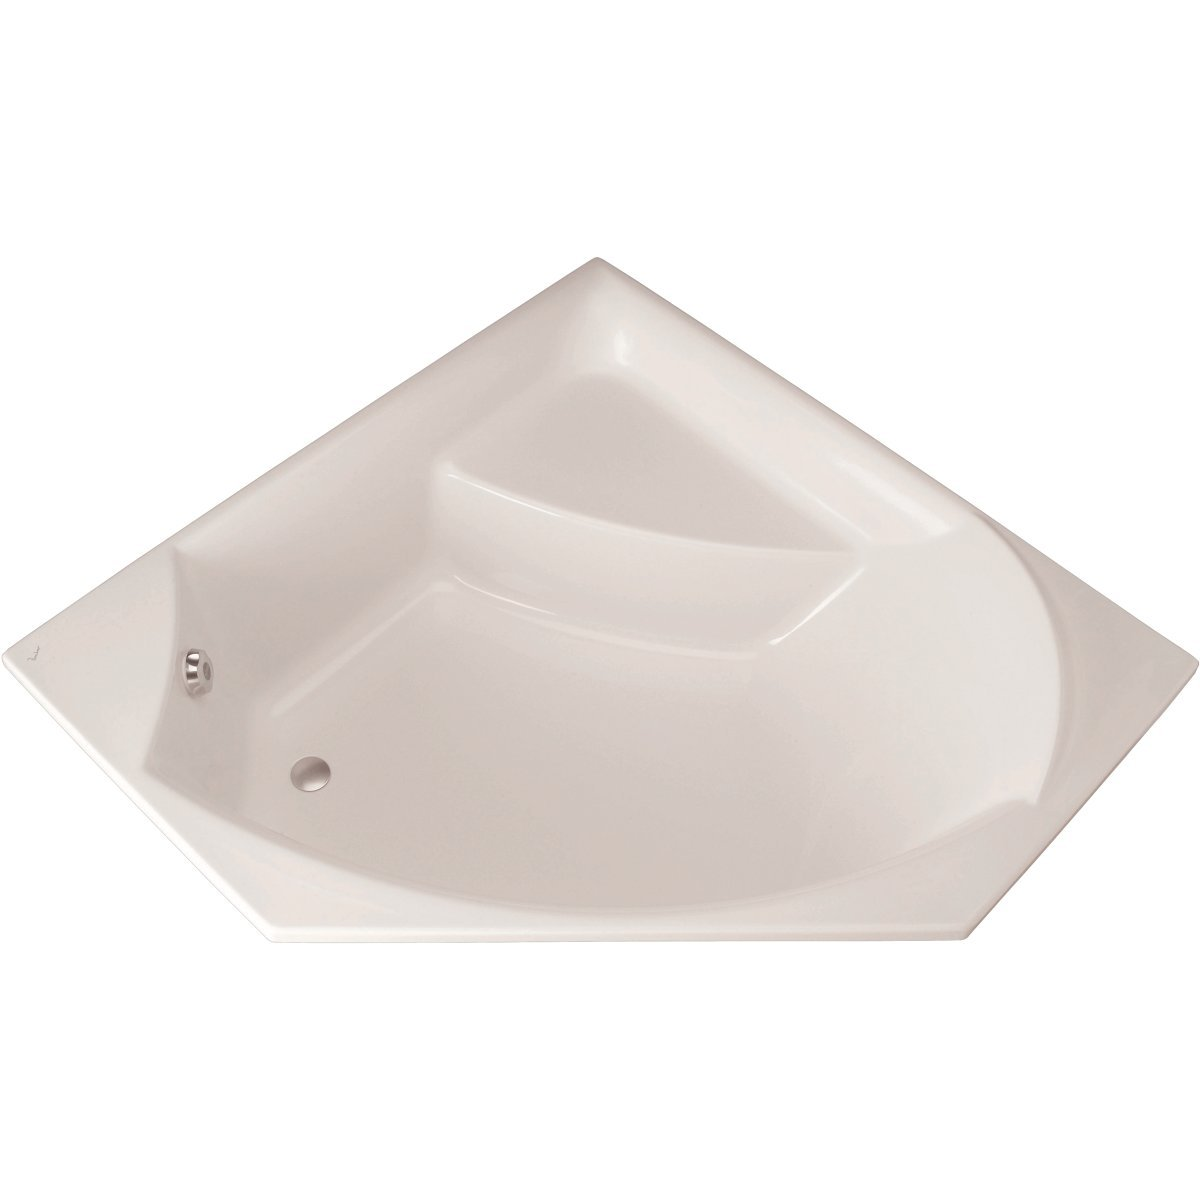 Baignoire kheops2 140 blanc ideal standard grenoble for Longueur baignoire standard